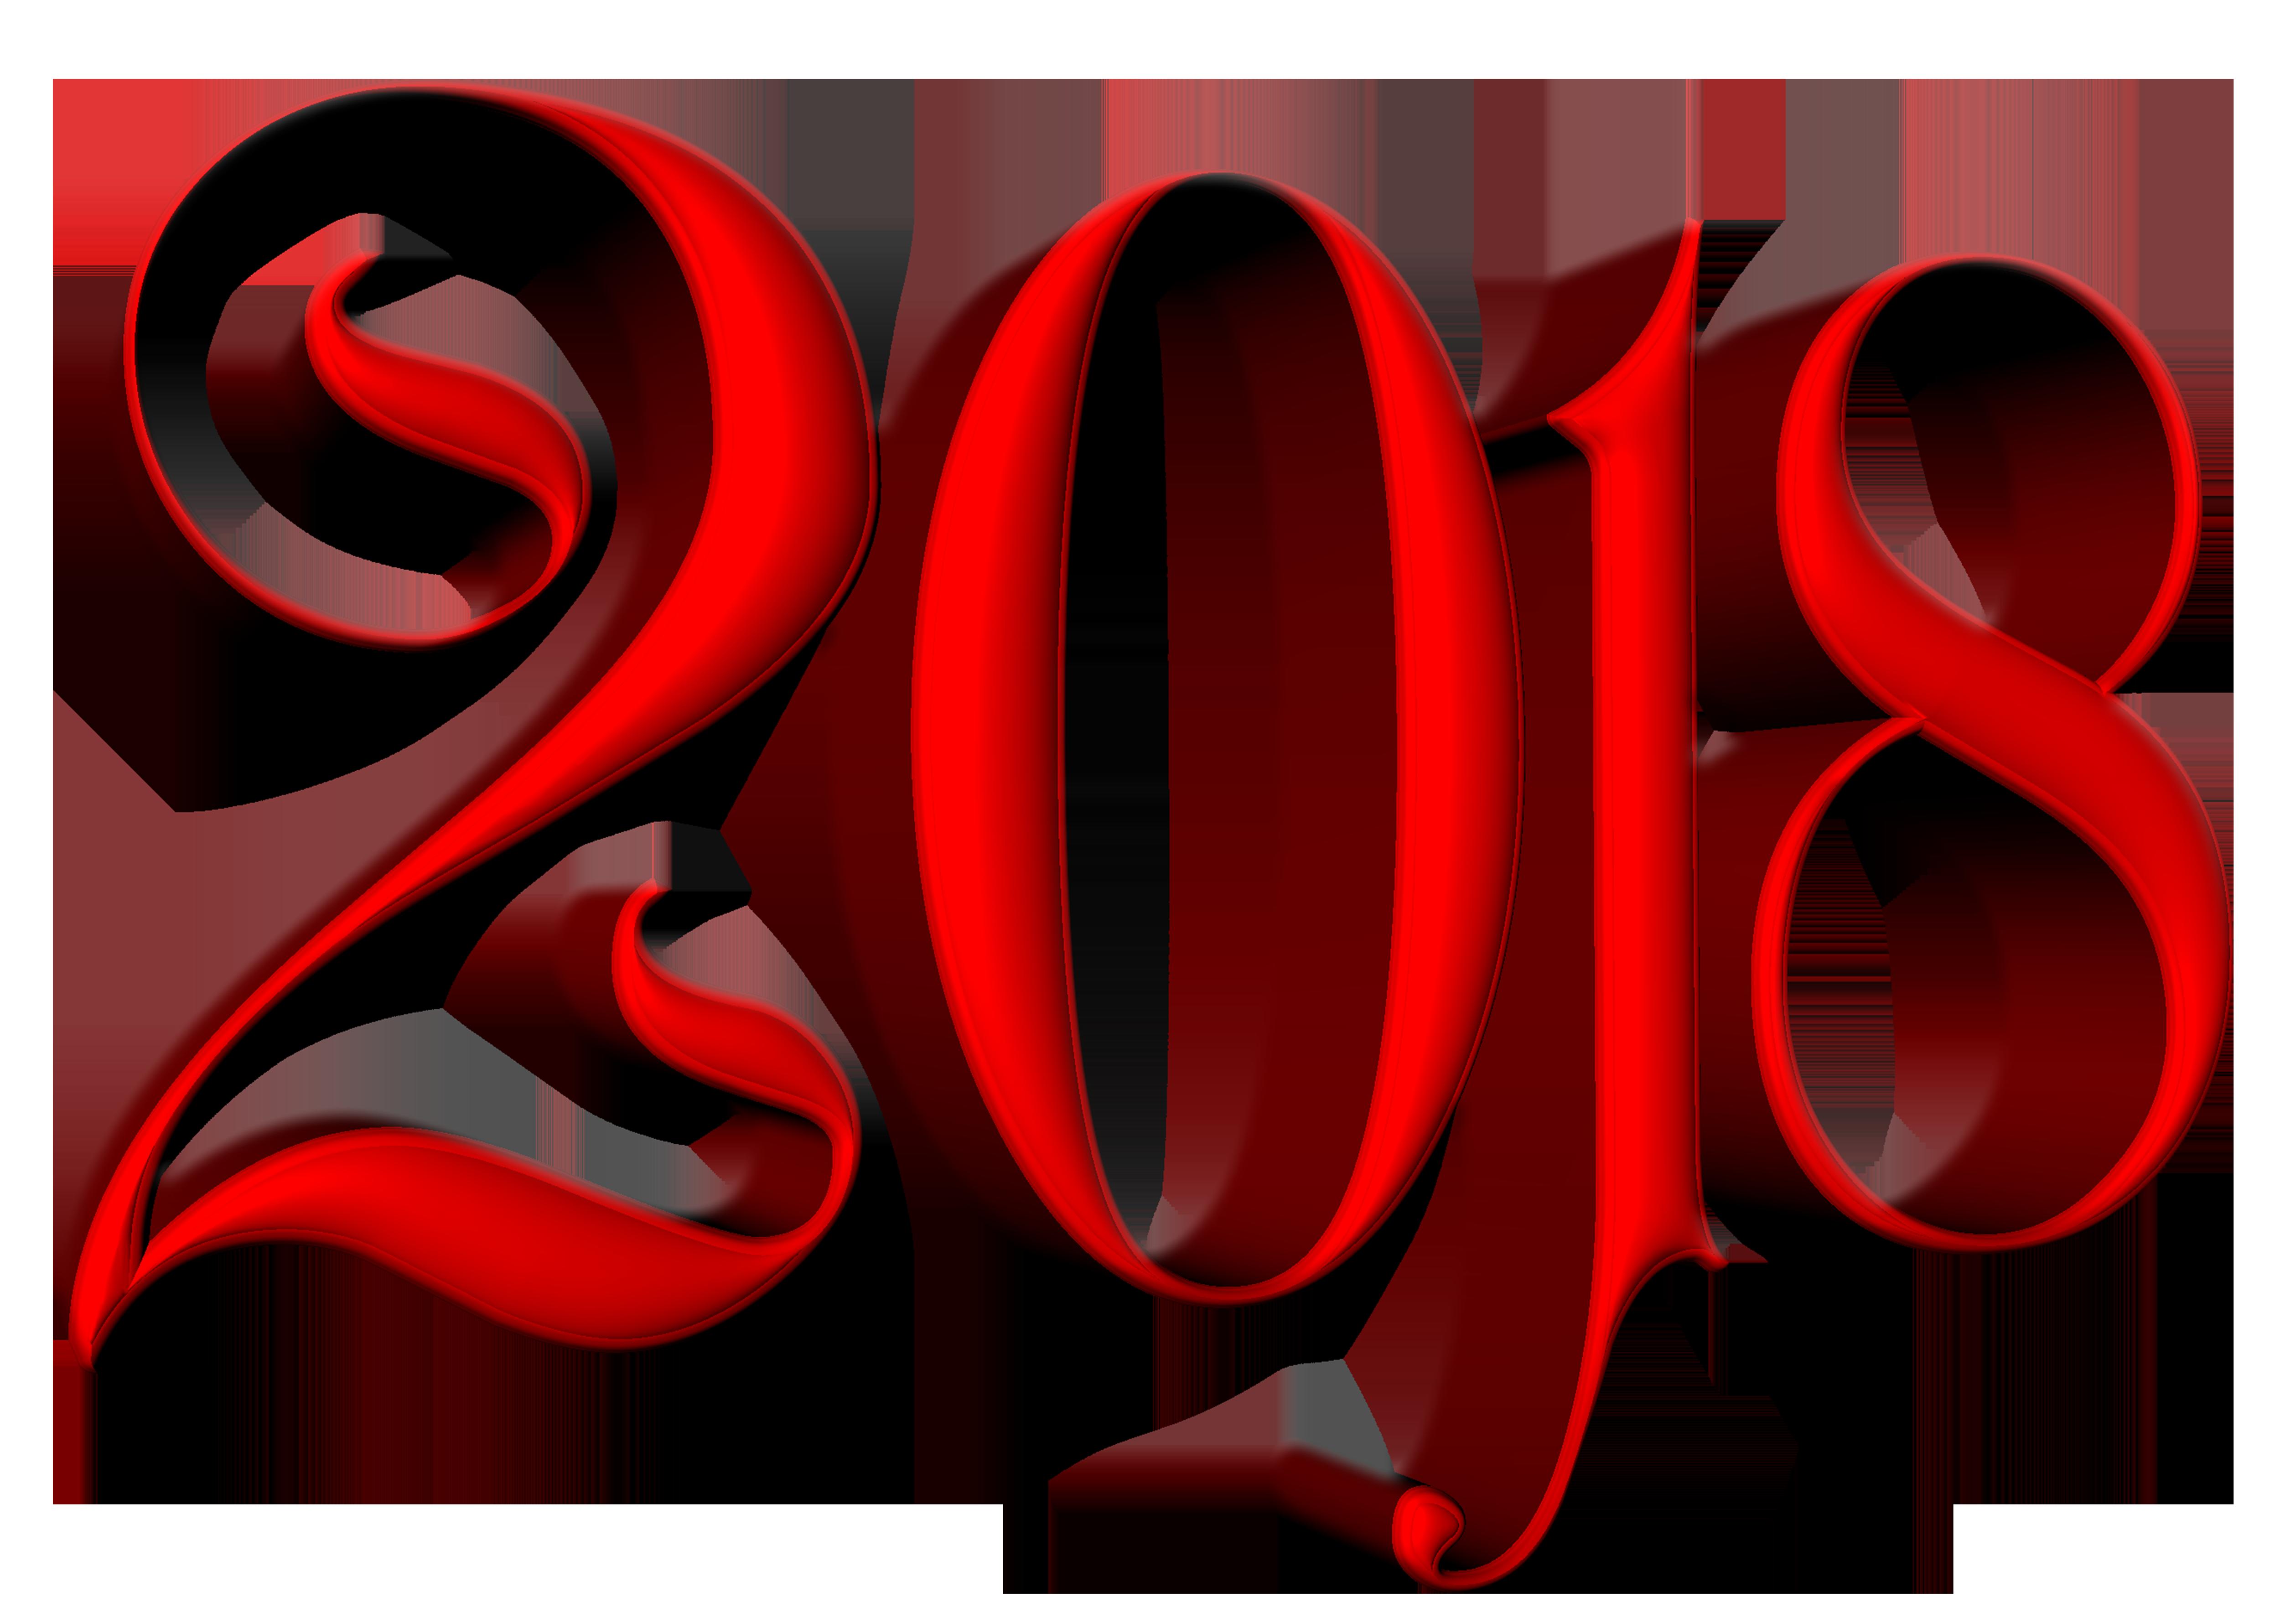 2018 Deco Transparent Clip Art Image.